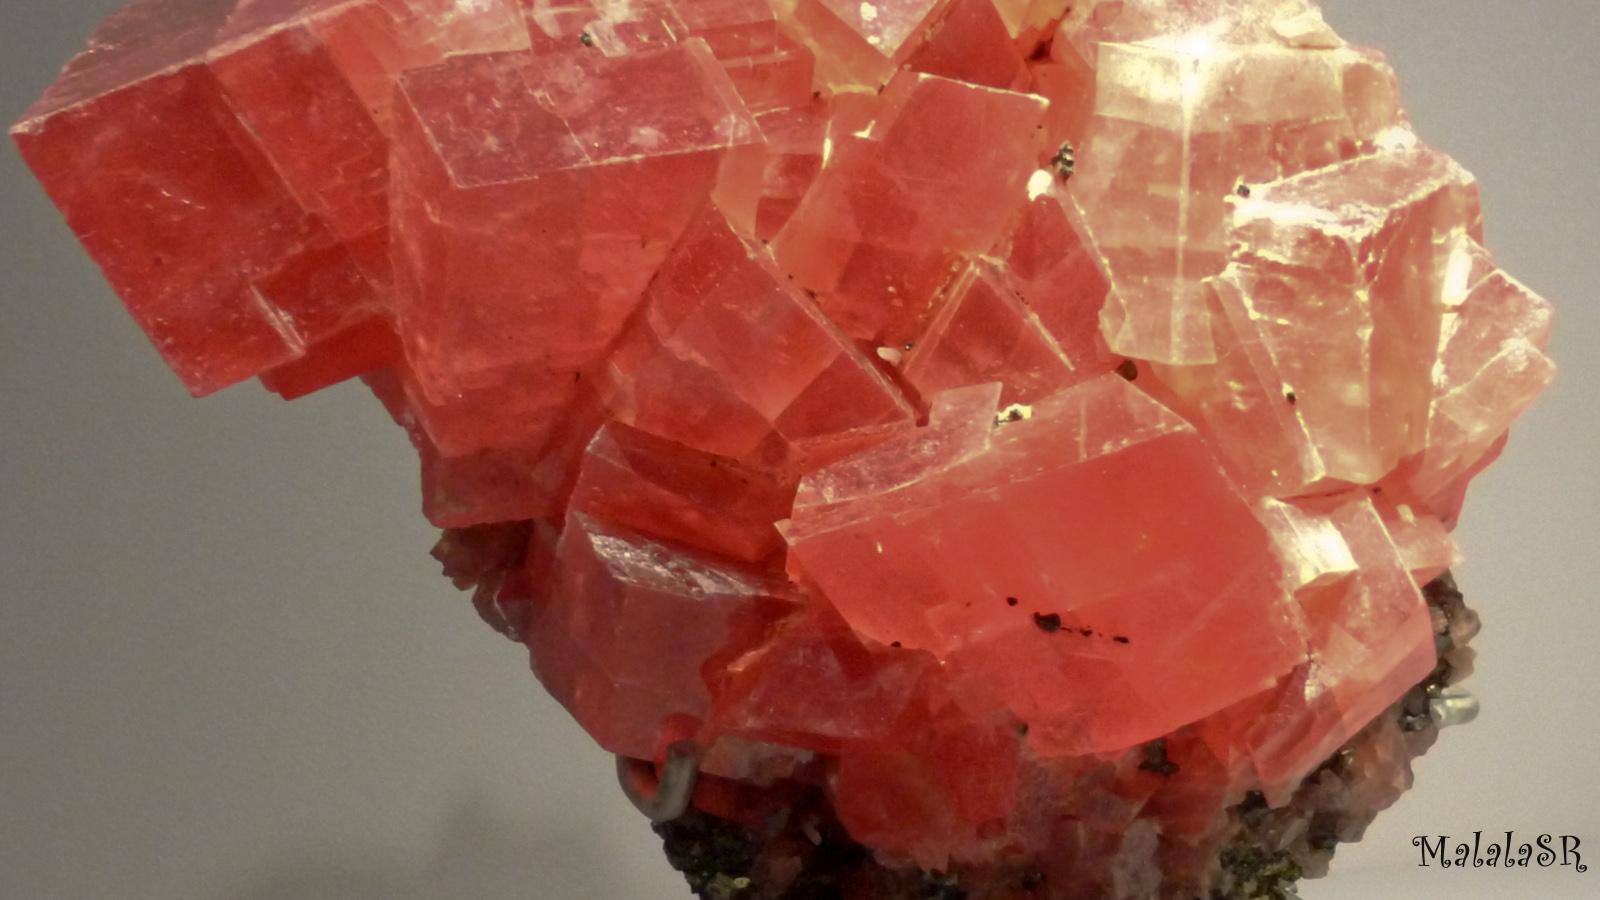 Stones malalasr 2